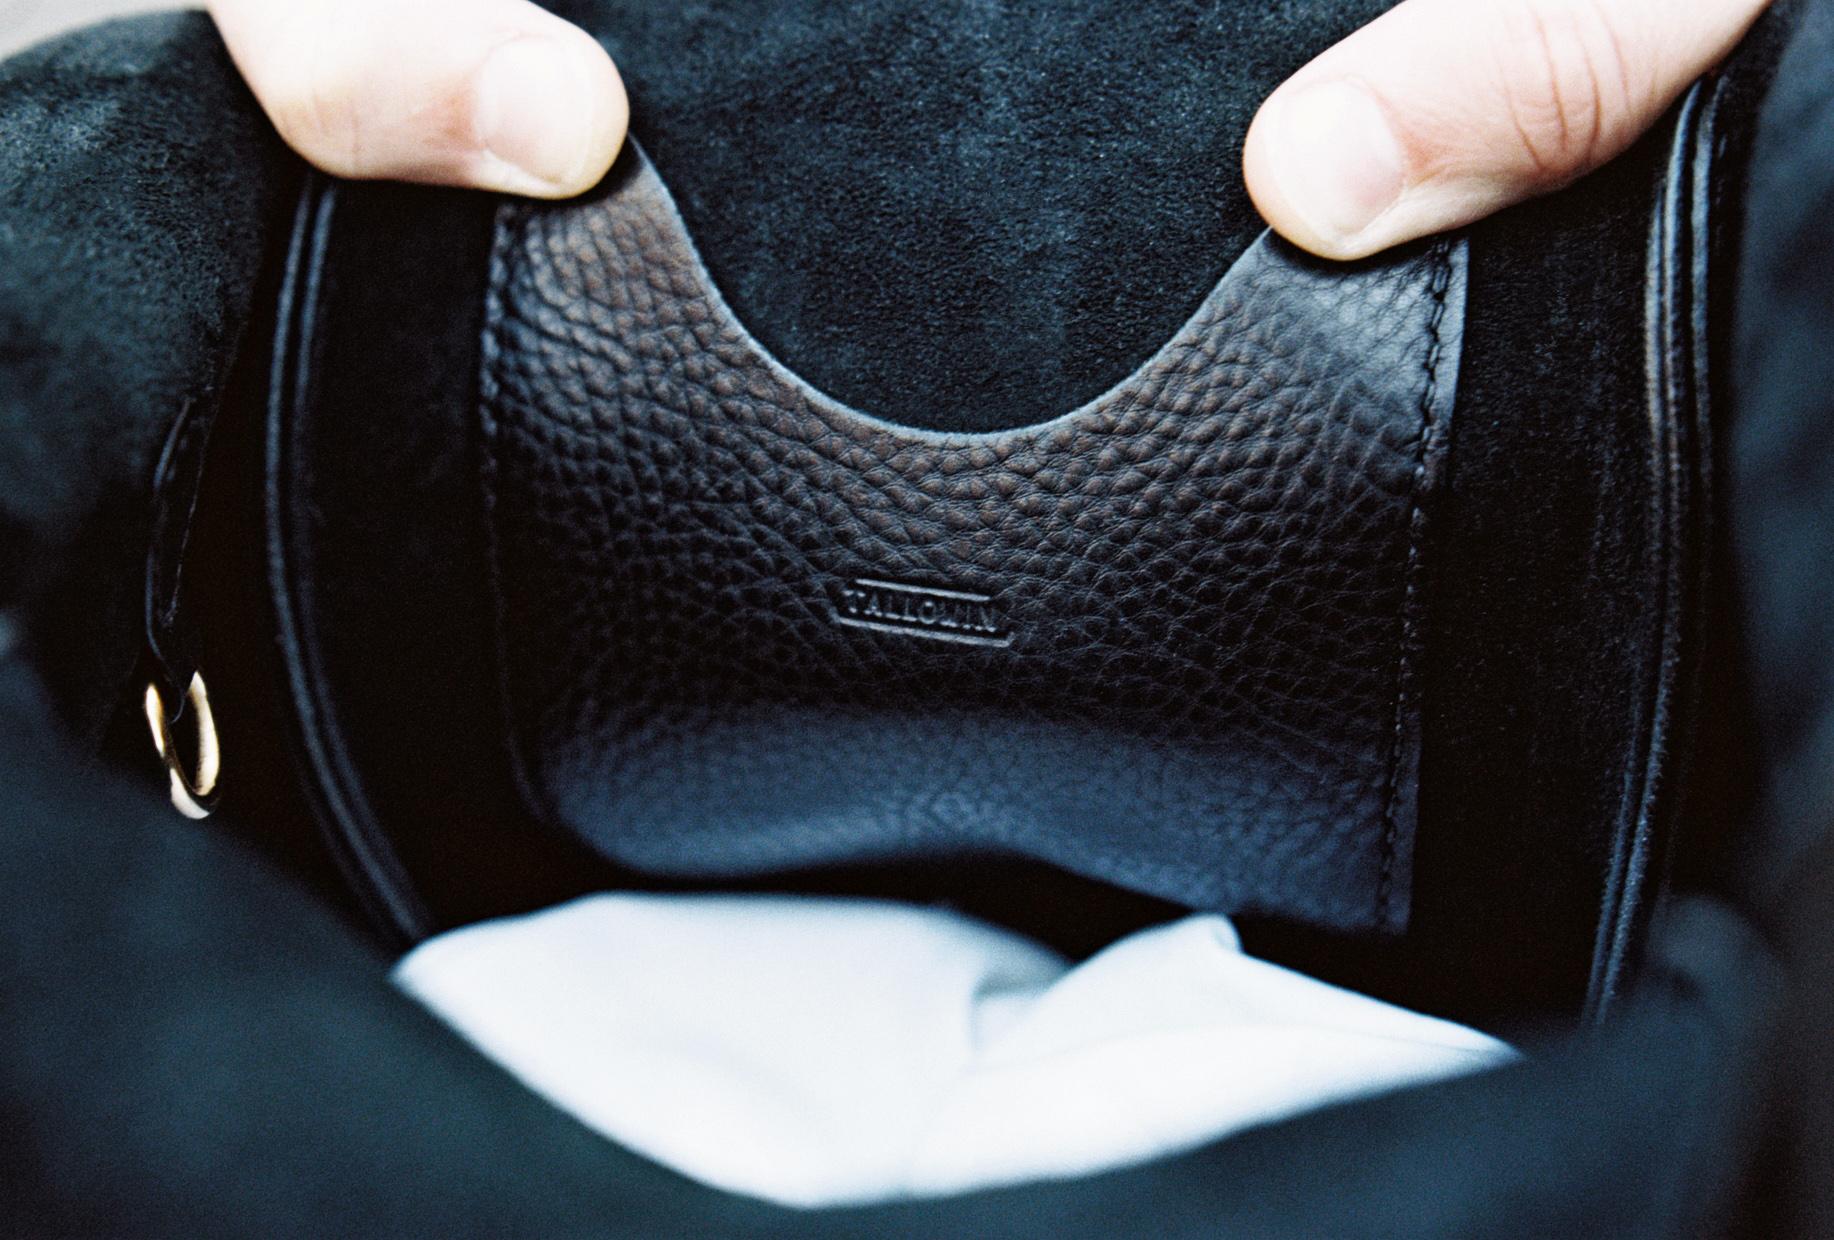 Copy of mark tallowin bag pocket